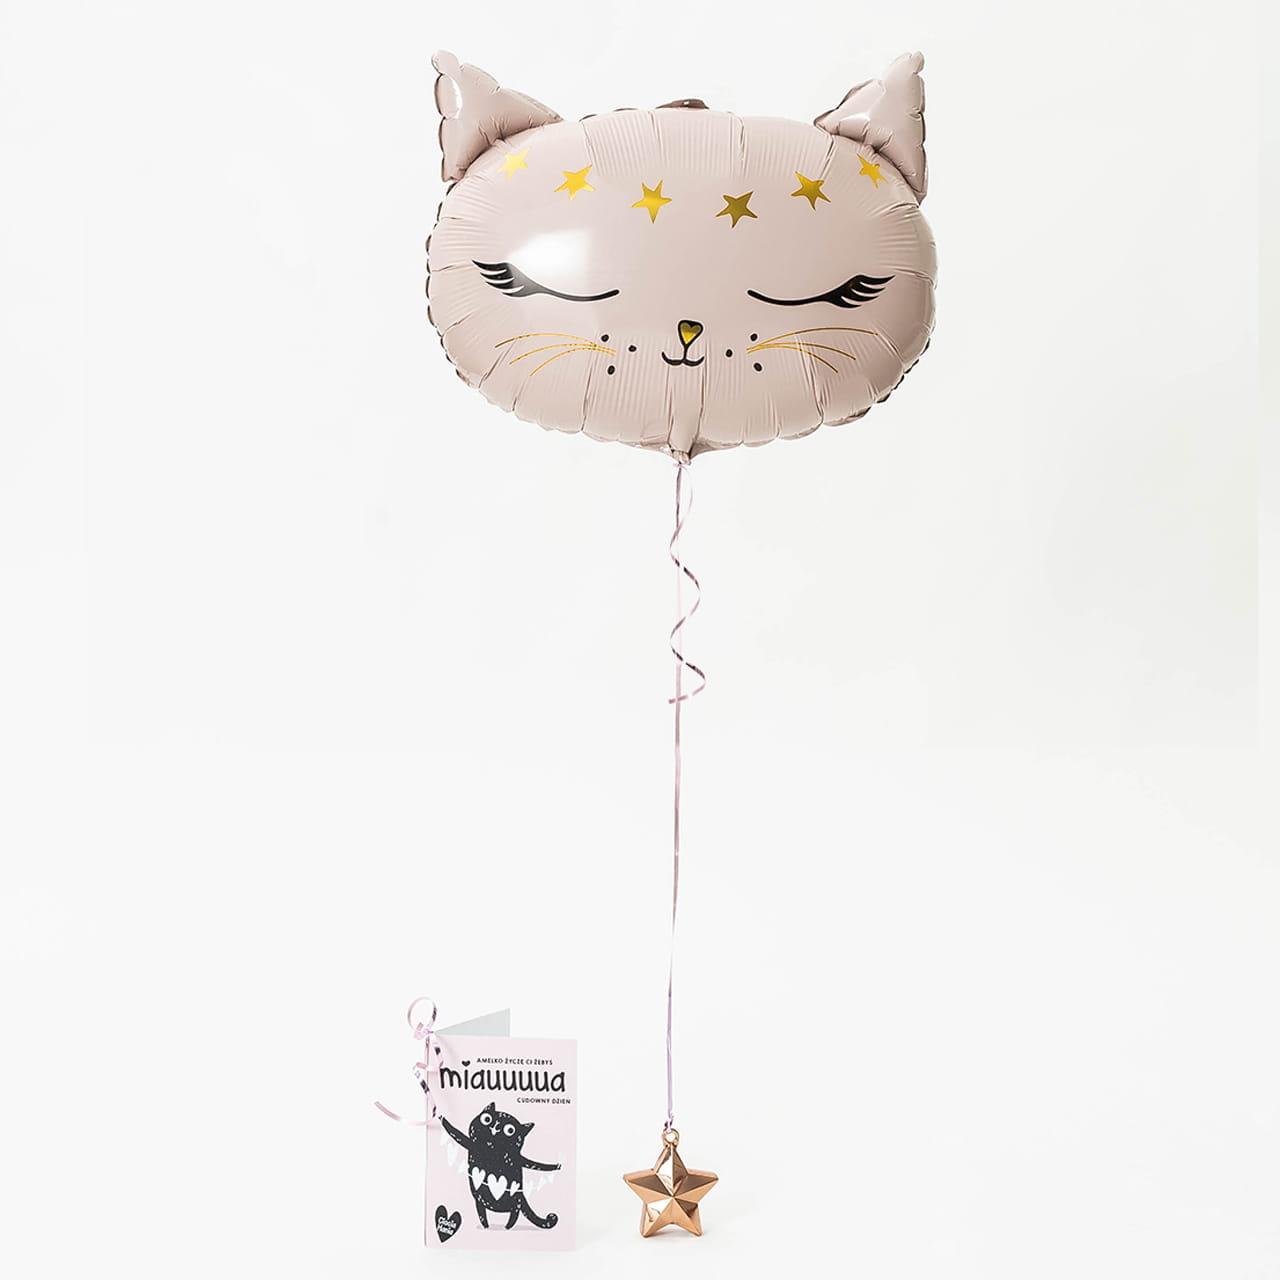 Balon w pudełku + kartka jako upominek na roczek